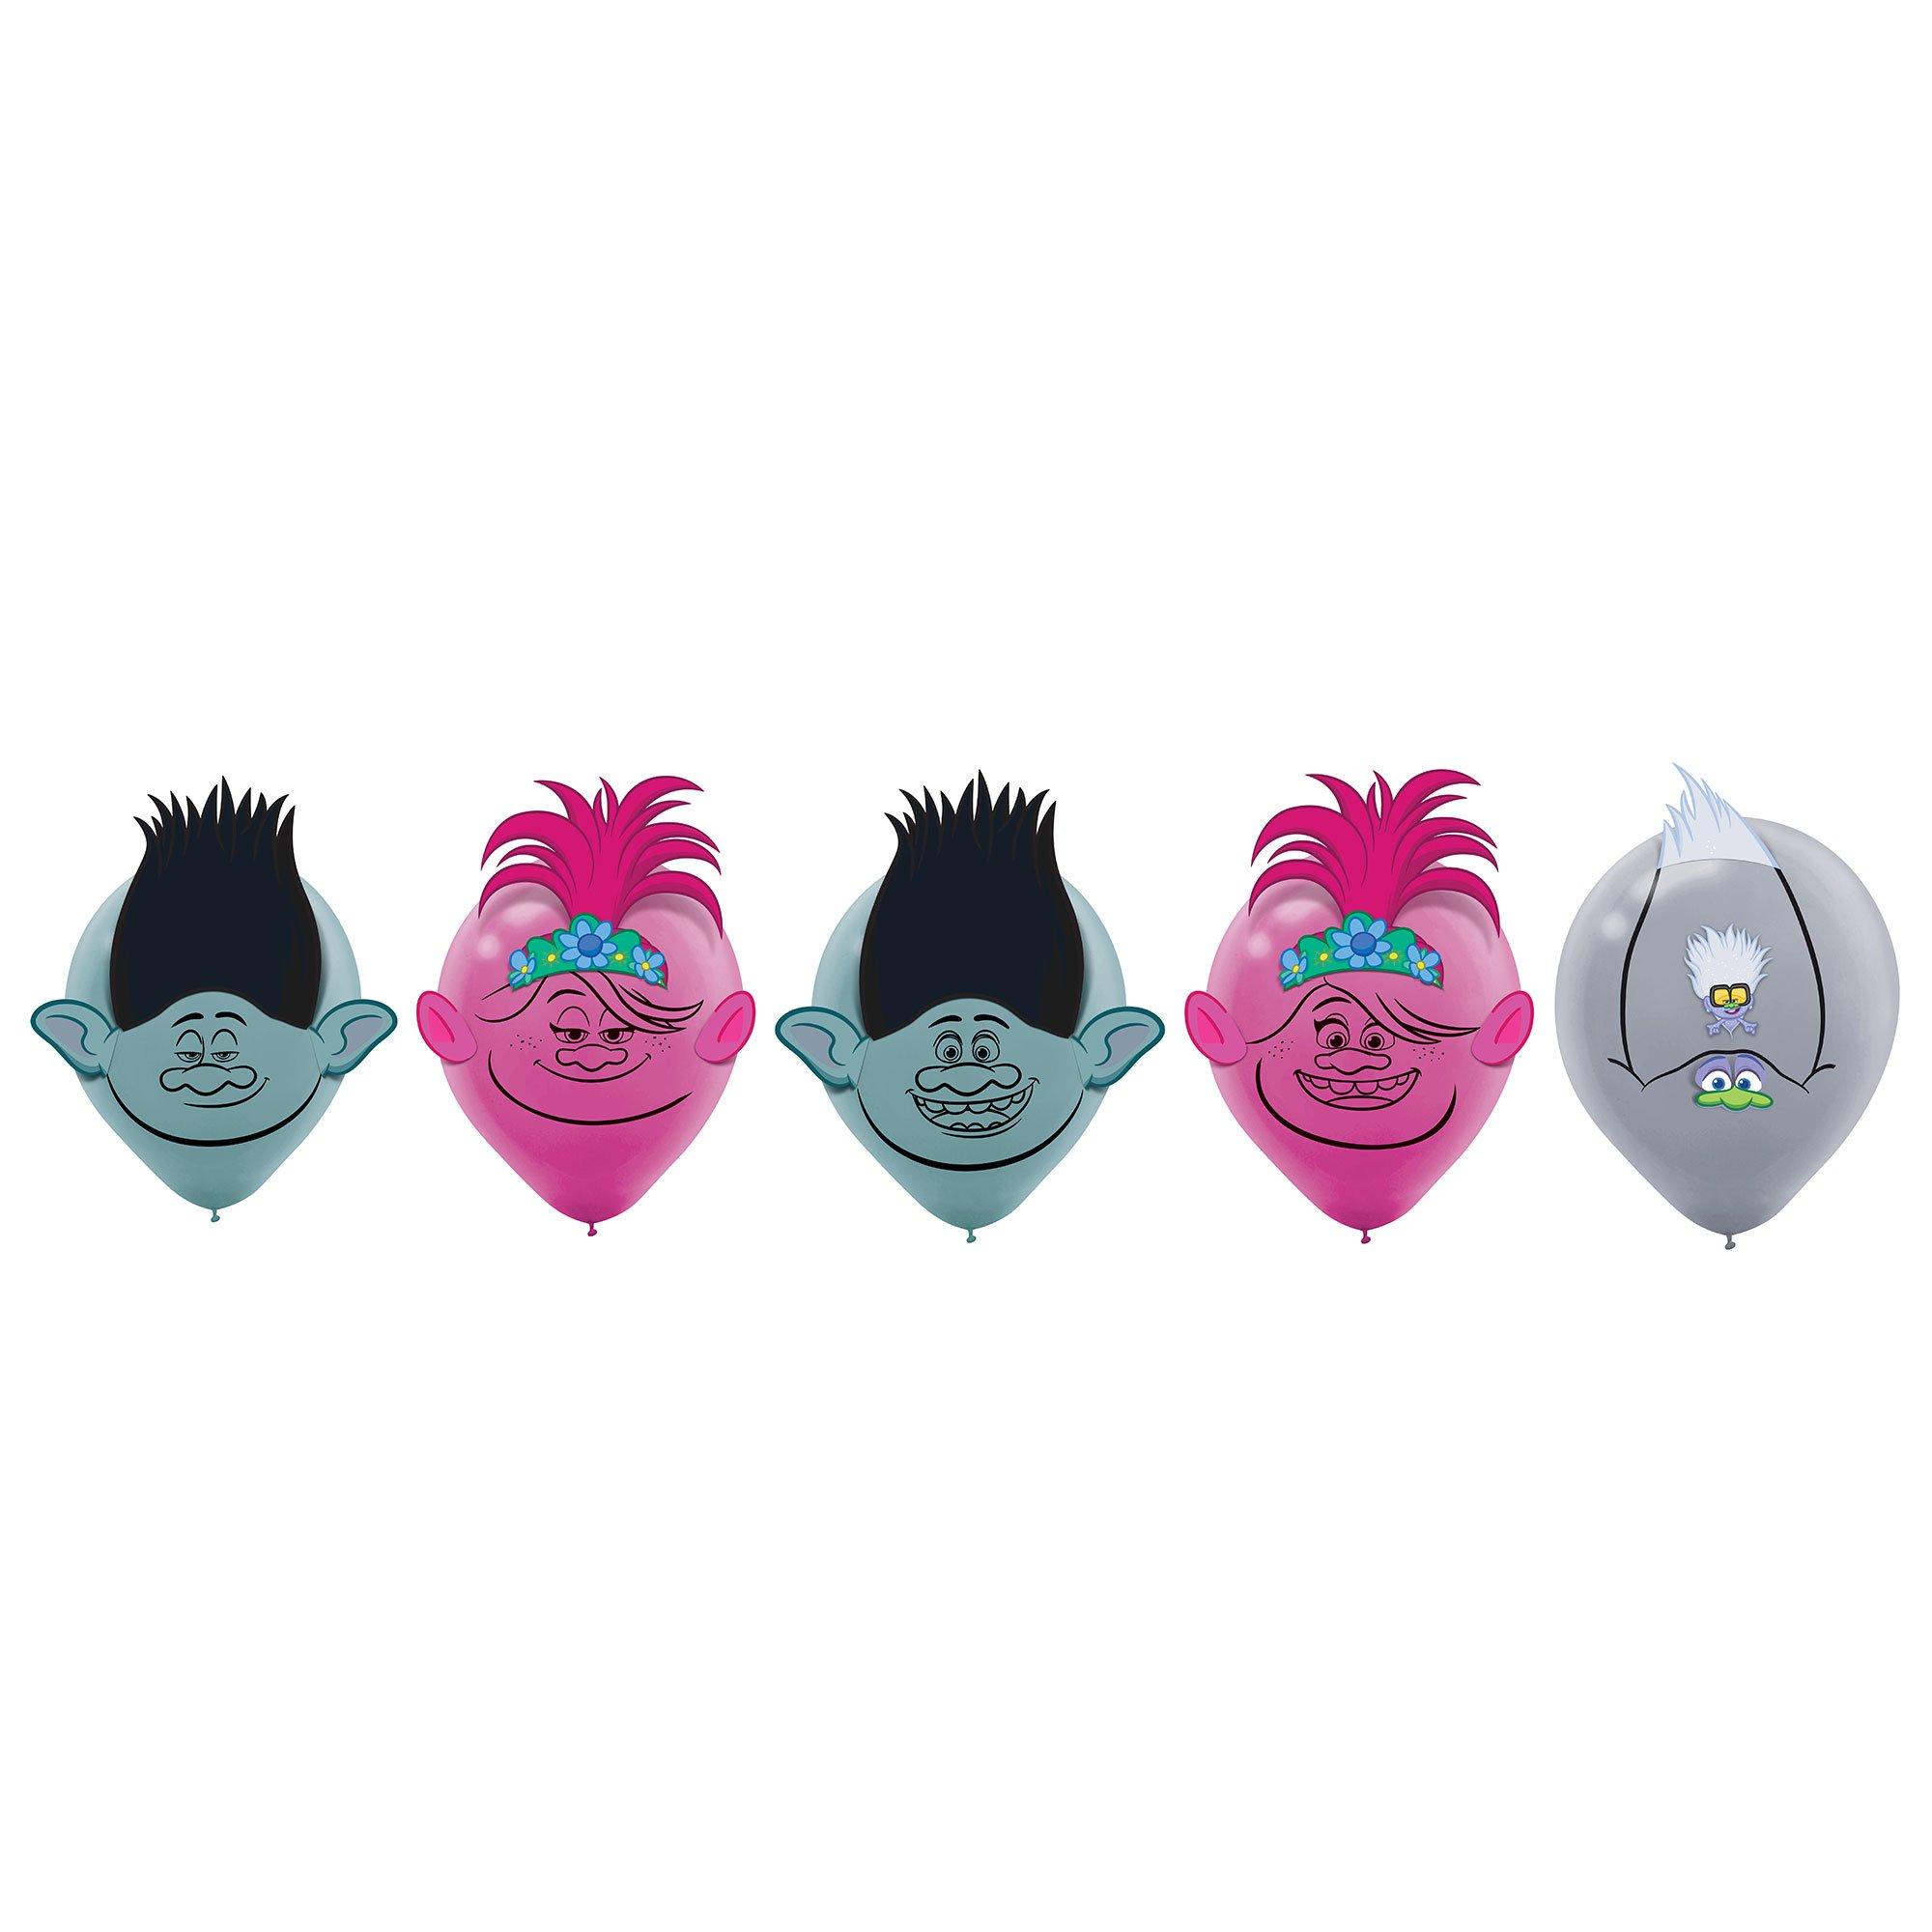 Trolls World Tour 30cm Latex Balloons Decorating Kit